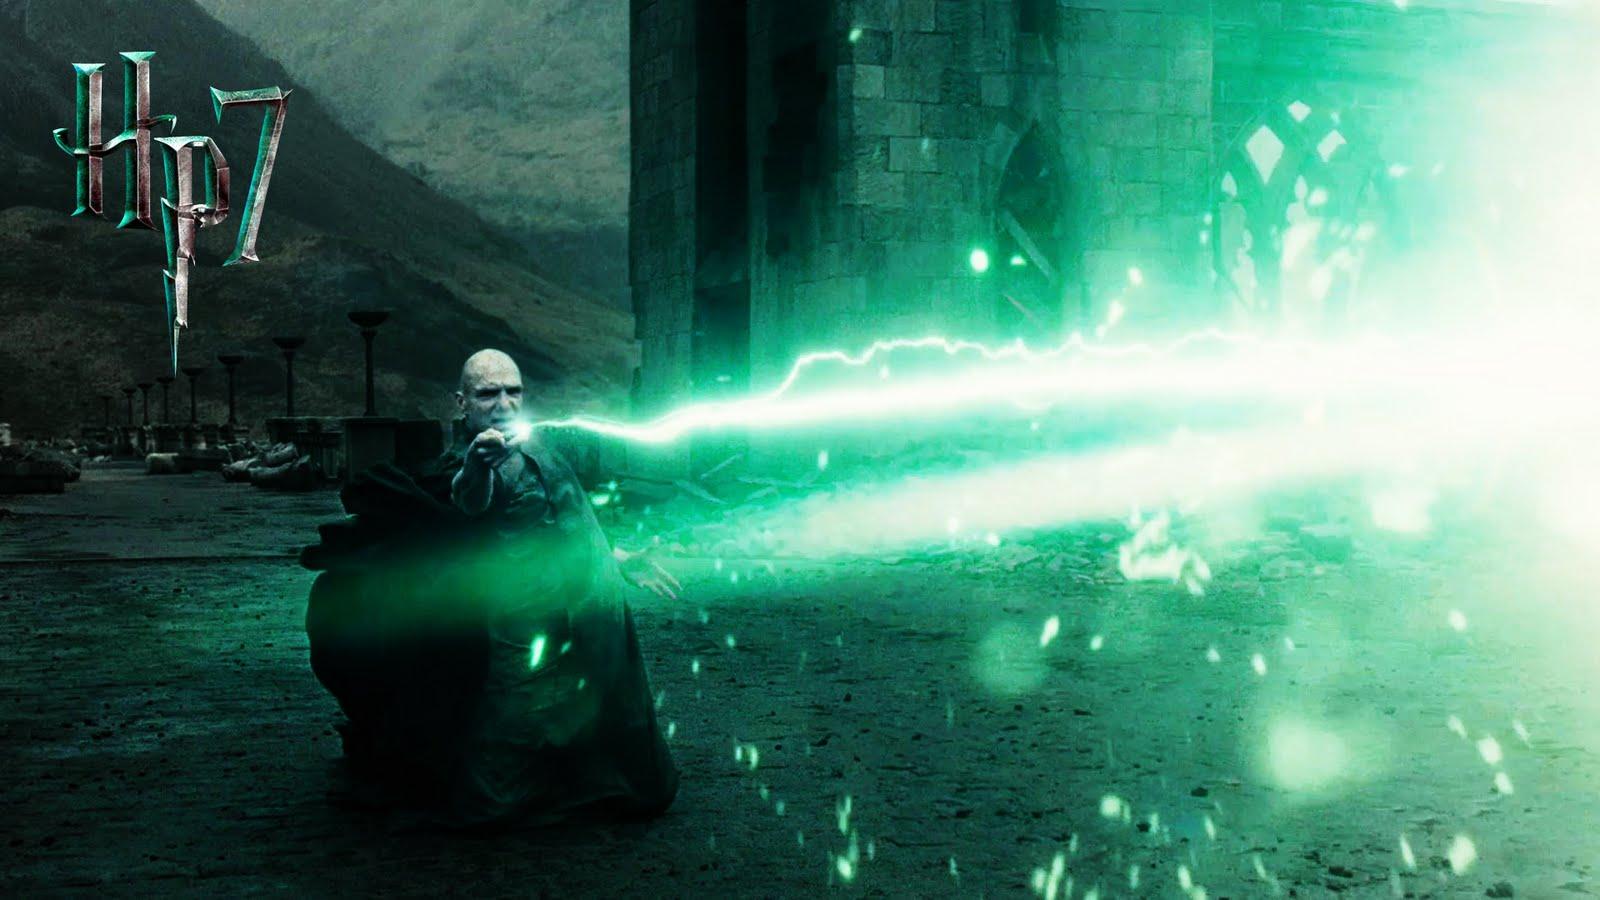 http://3.bp.blogspot.com/-APxYvKGh9zo/Tg_kJTt5JSI/AAAAAAAAAP0/iuuAmztrnwk/s1600/Harry-Potter-7-free-wallpaper.jpg